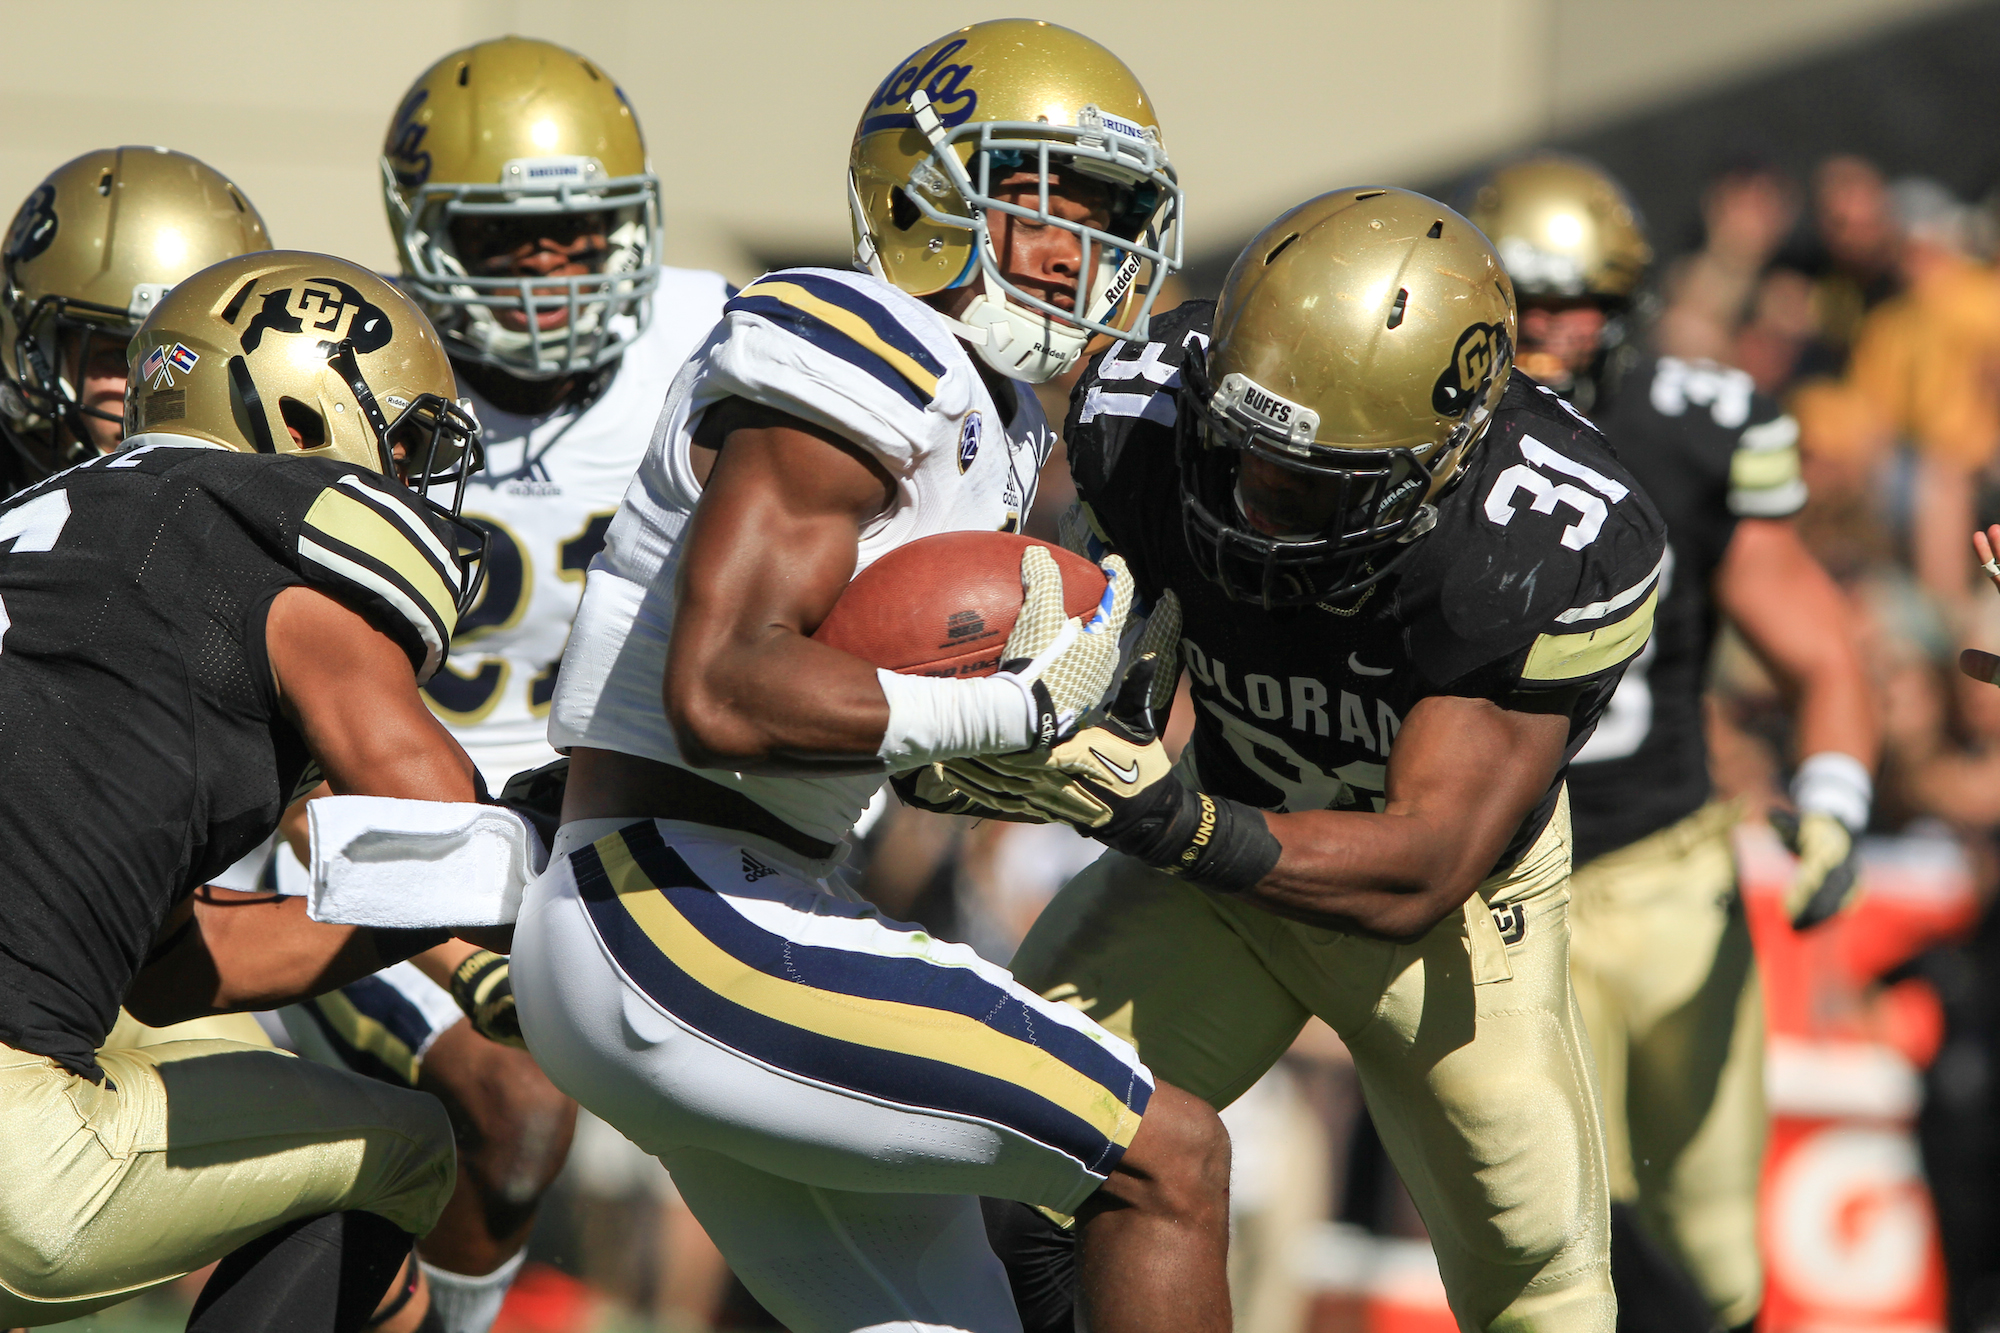 Then-sophomore linebacker Kenneth Olugbode tackles a UCLA ball carrier on Oct. 25, 2014 at Folsom Field. (Nigel Amstock/CU Independent File)